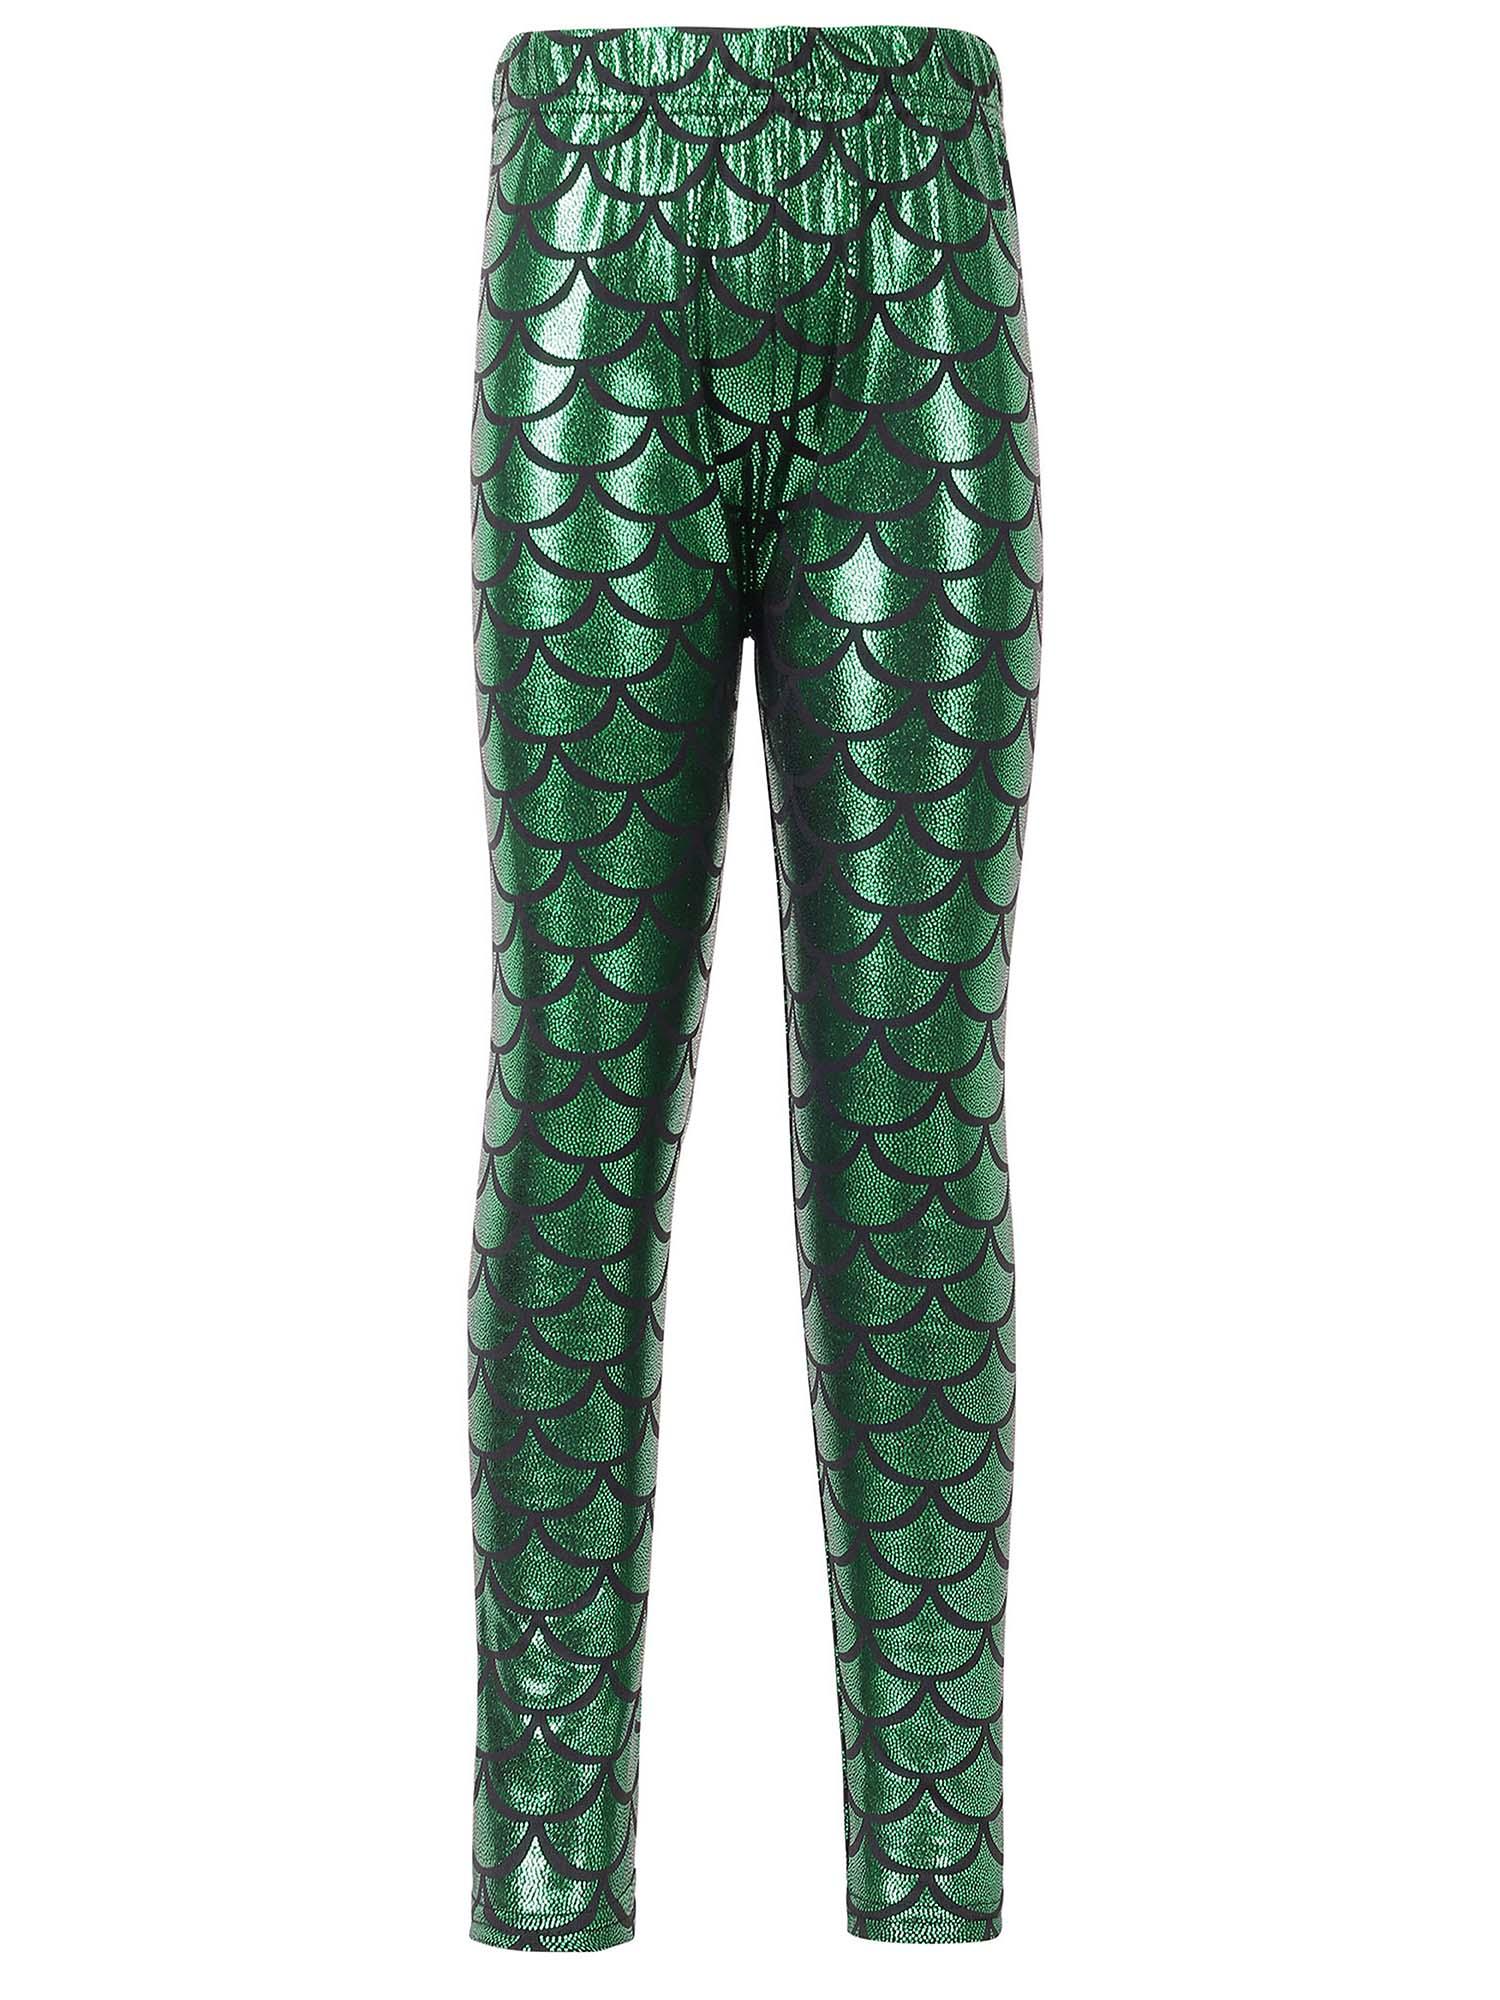 Kids Girls Night Club Full Length Mermaid Fish Scale Print Leggings Pants Blue S